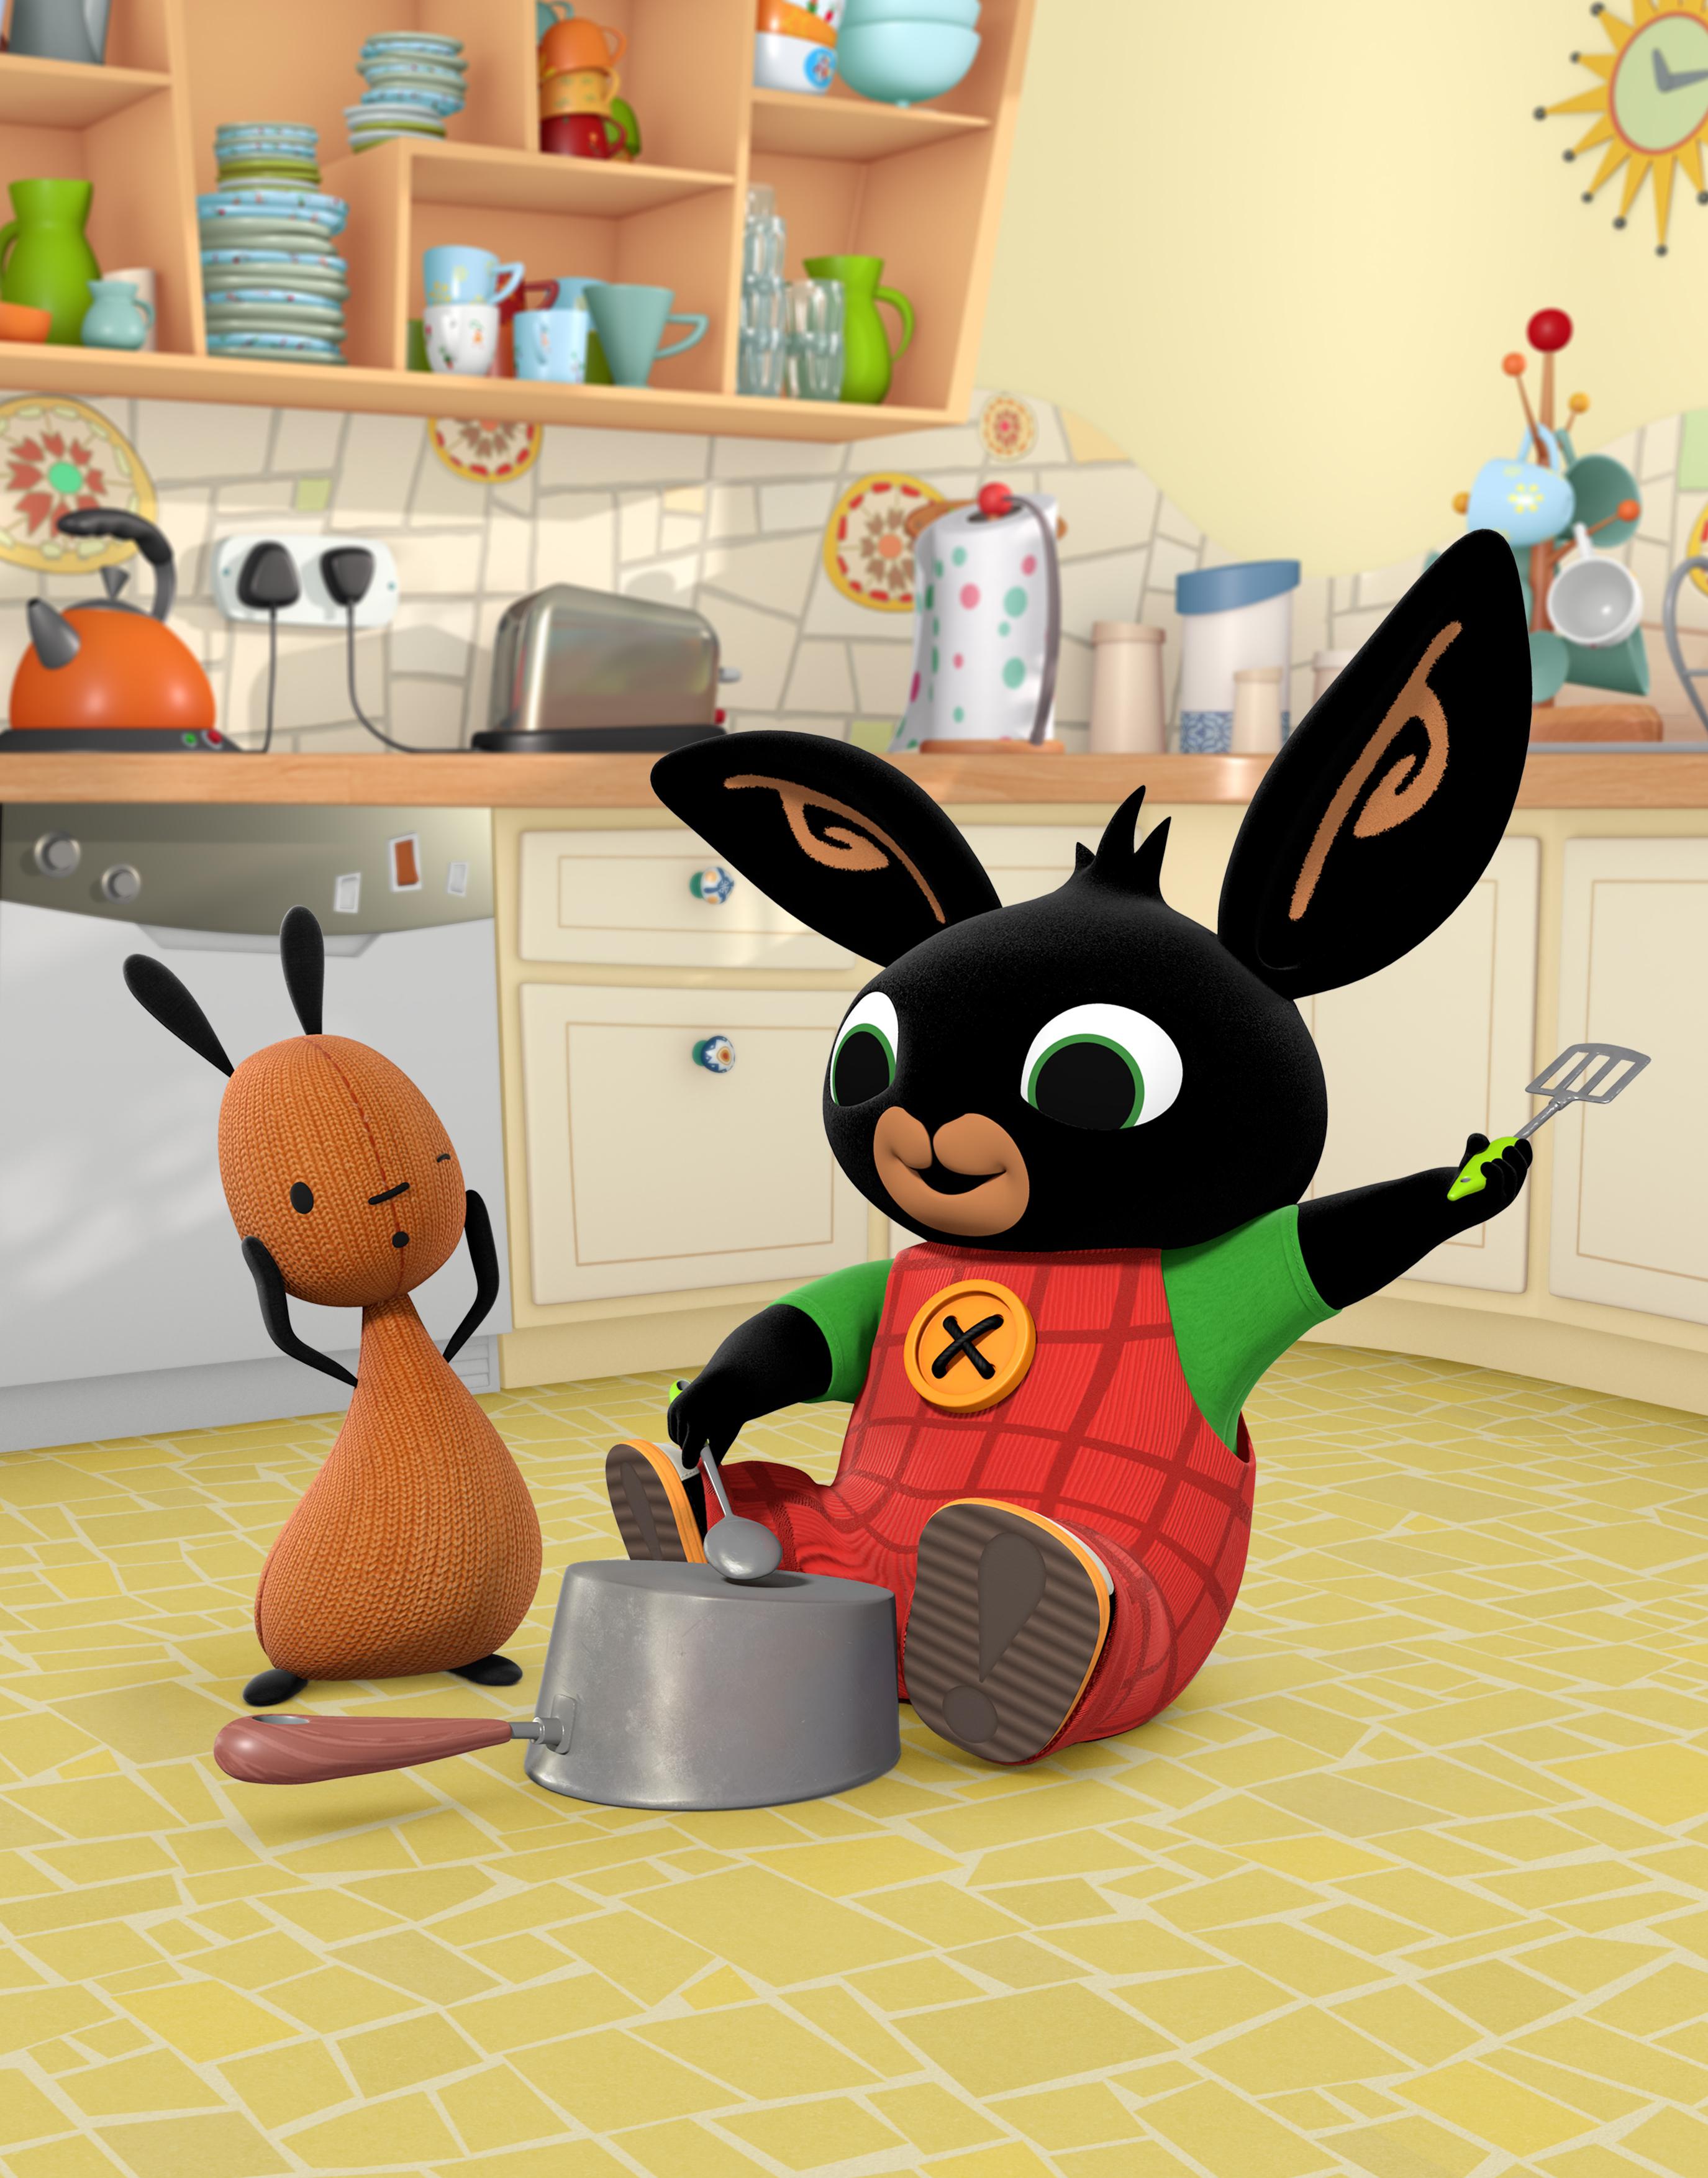 Acamar Films - Bing Bunny and Flop Kitchen